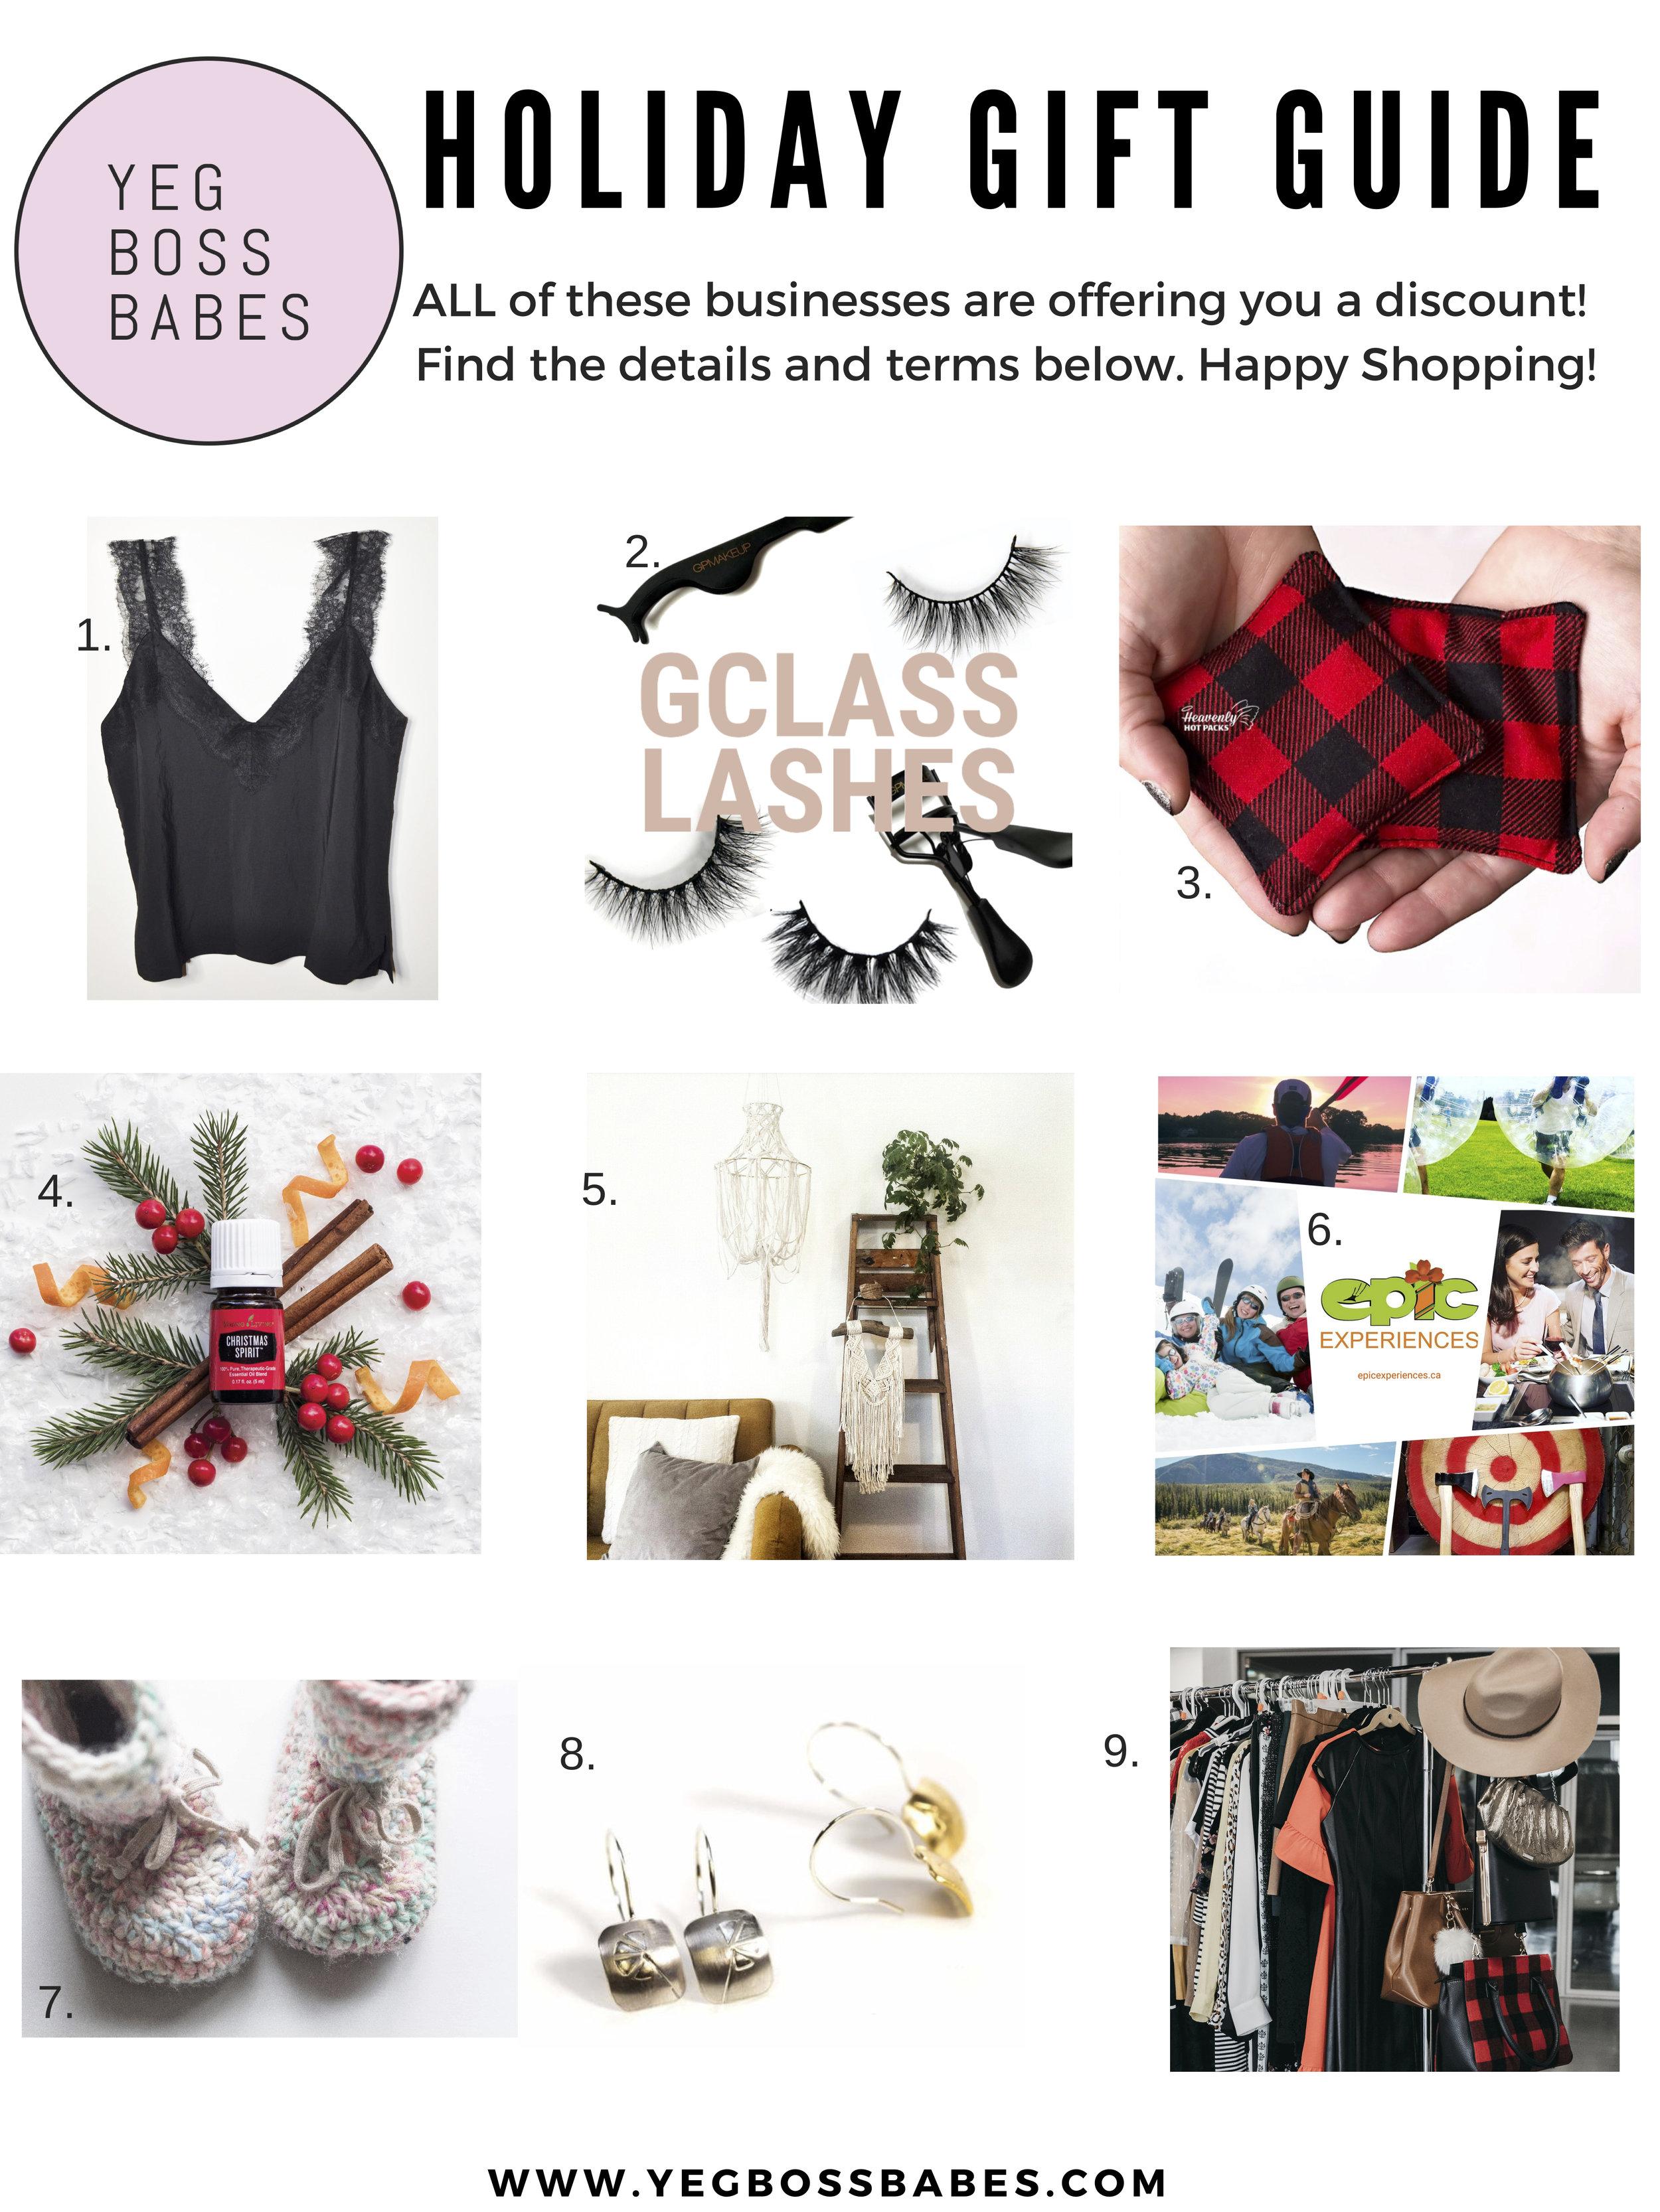 Holiday gift guide pg 1.jpg